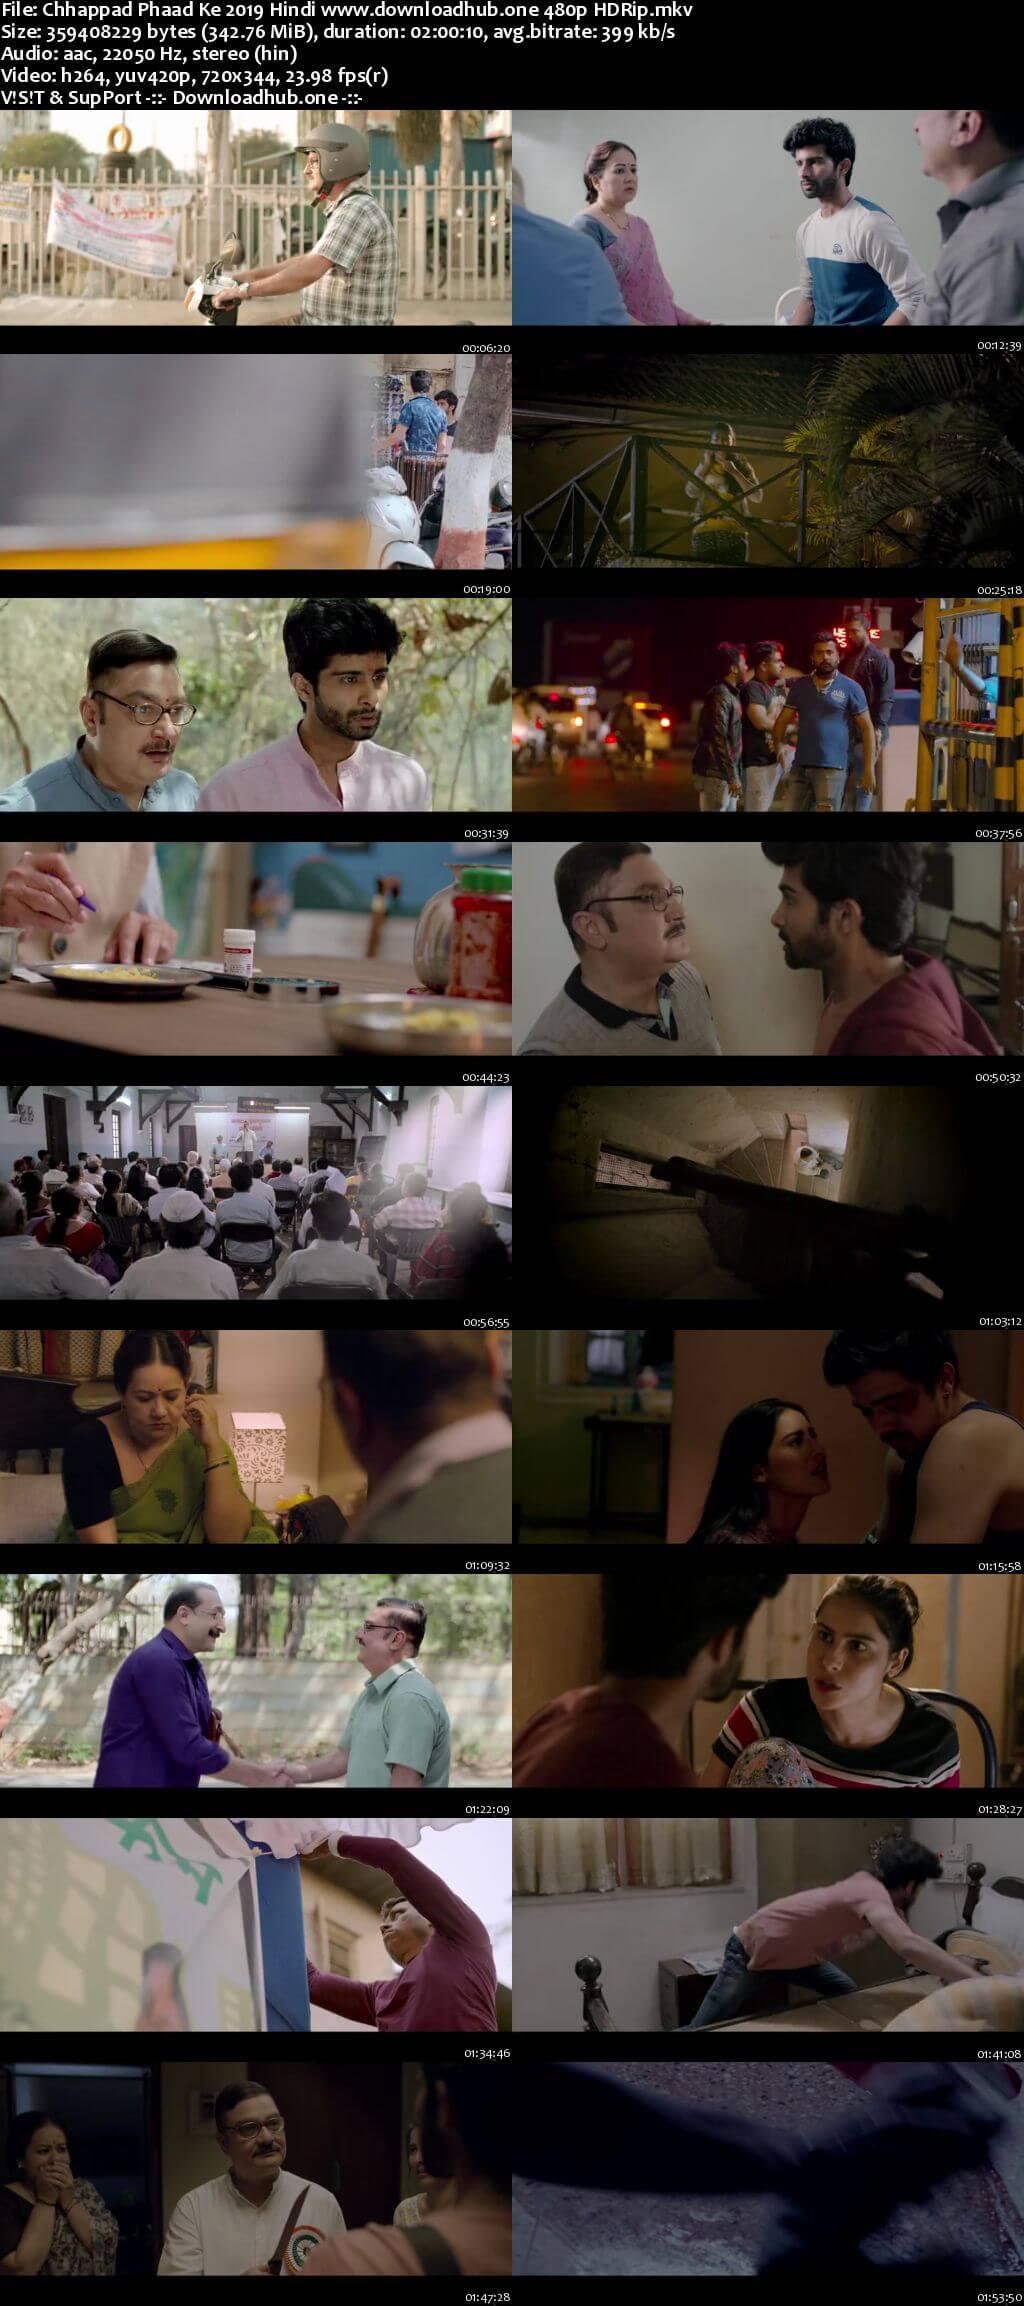 Chhappad Phaad Ke 2019 Hindi 300MB HDRip 480p